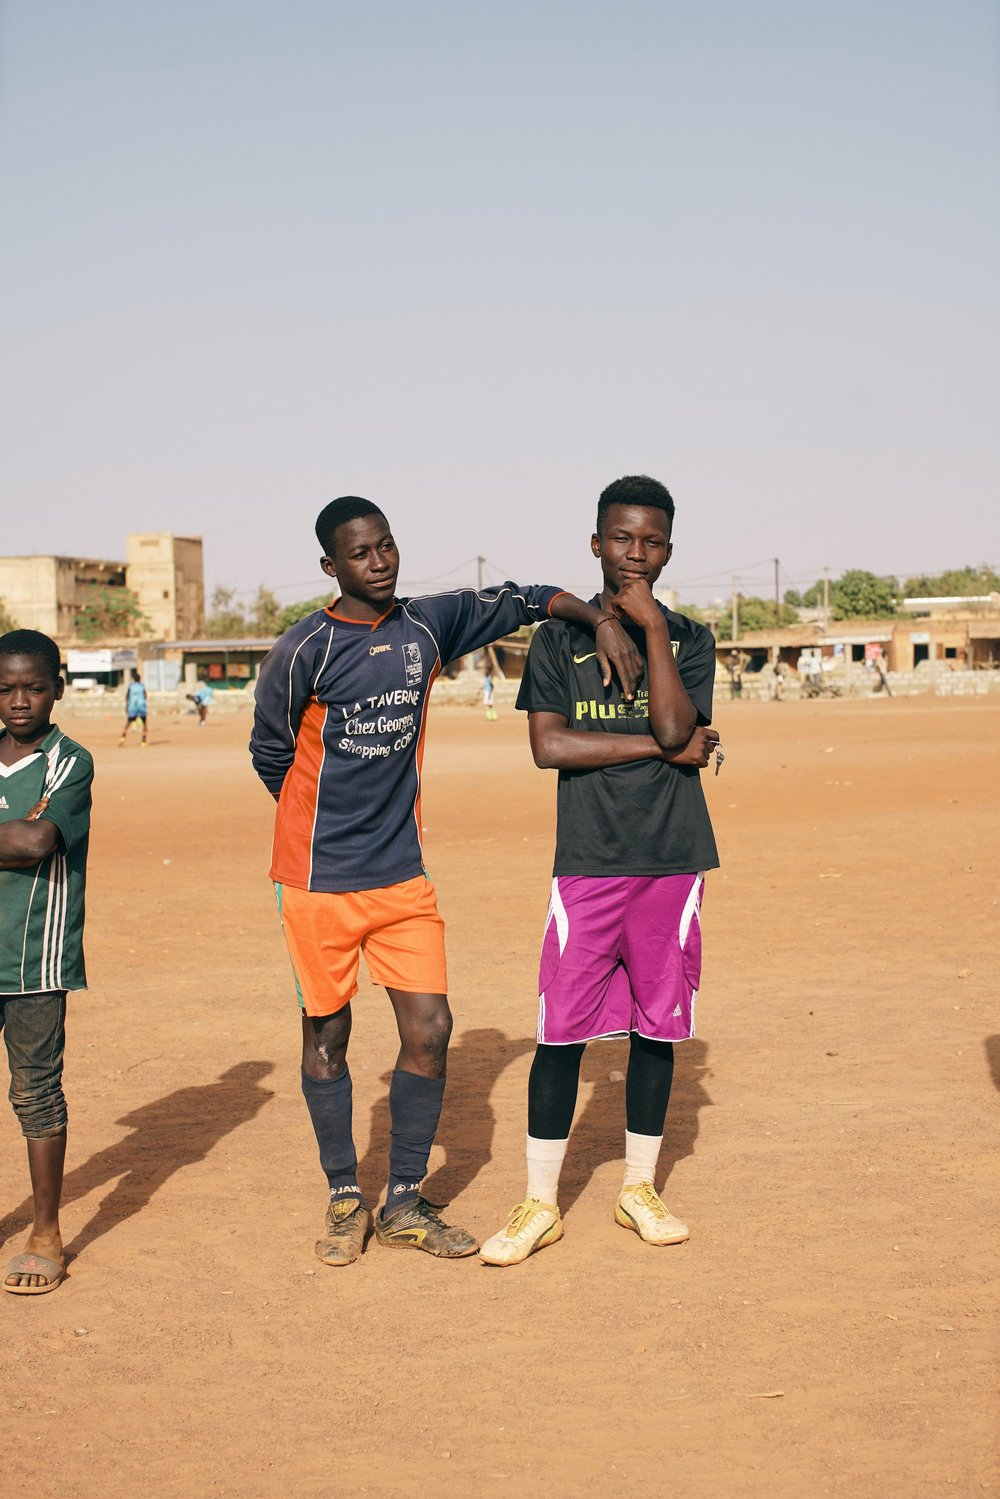 Stockdale_Ouagadougou41.jpg